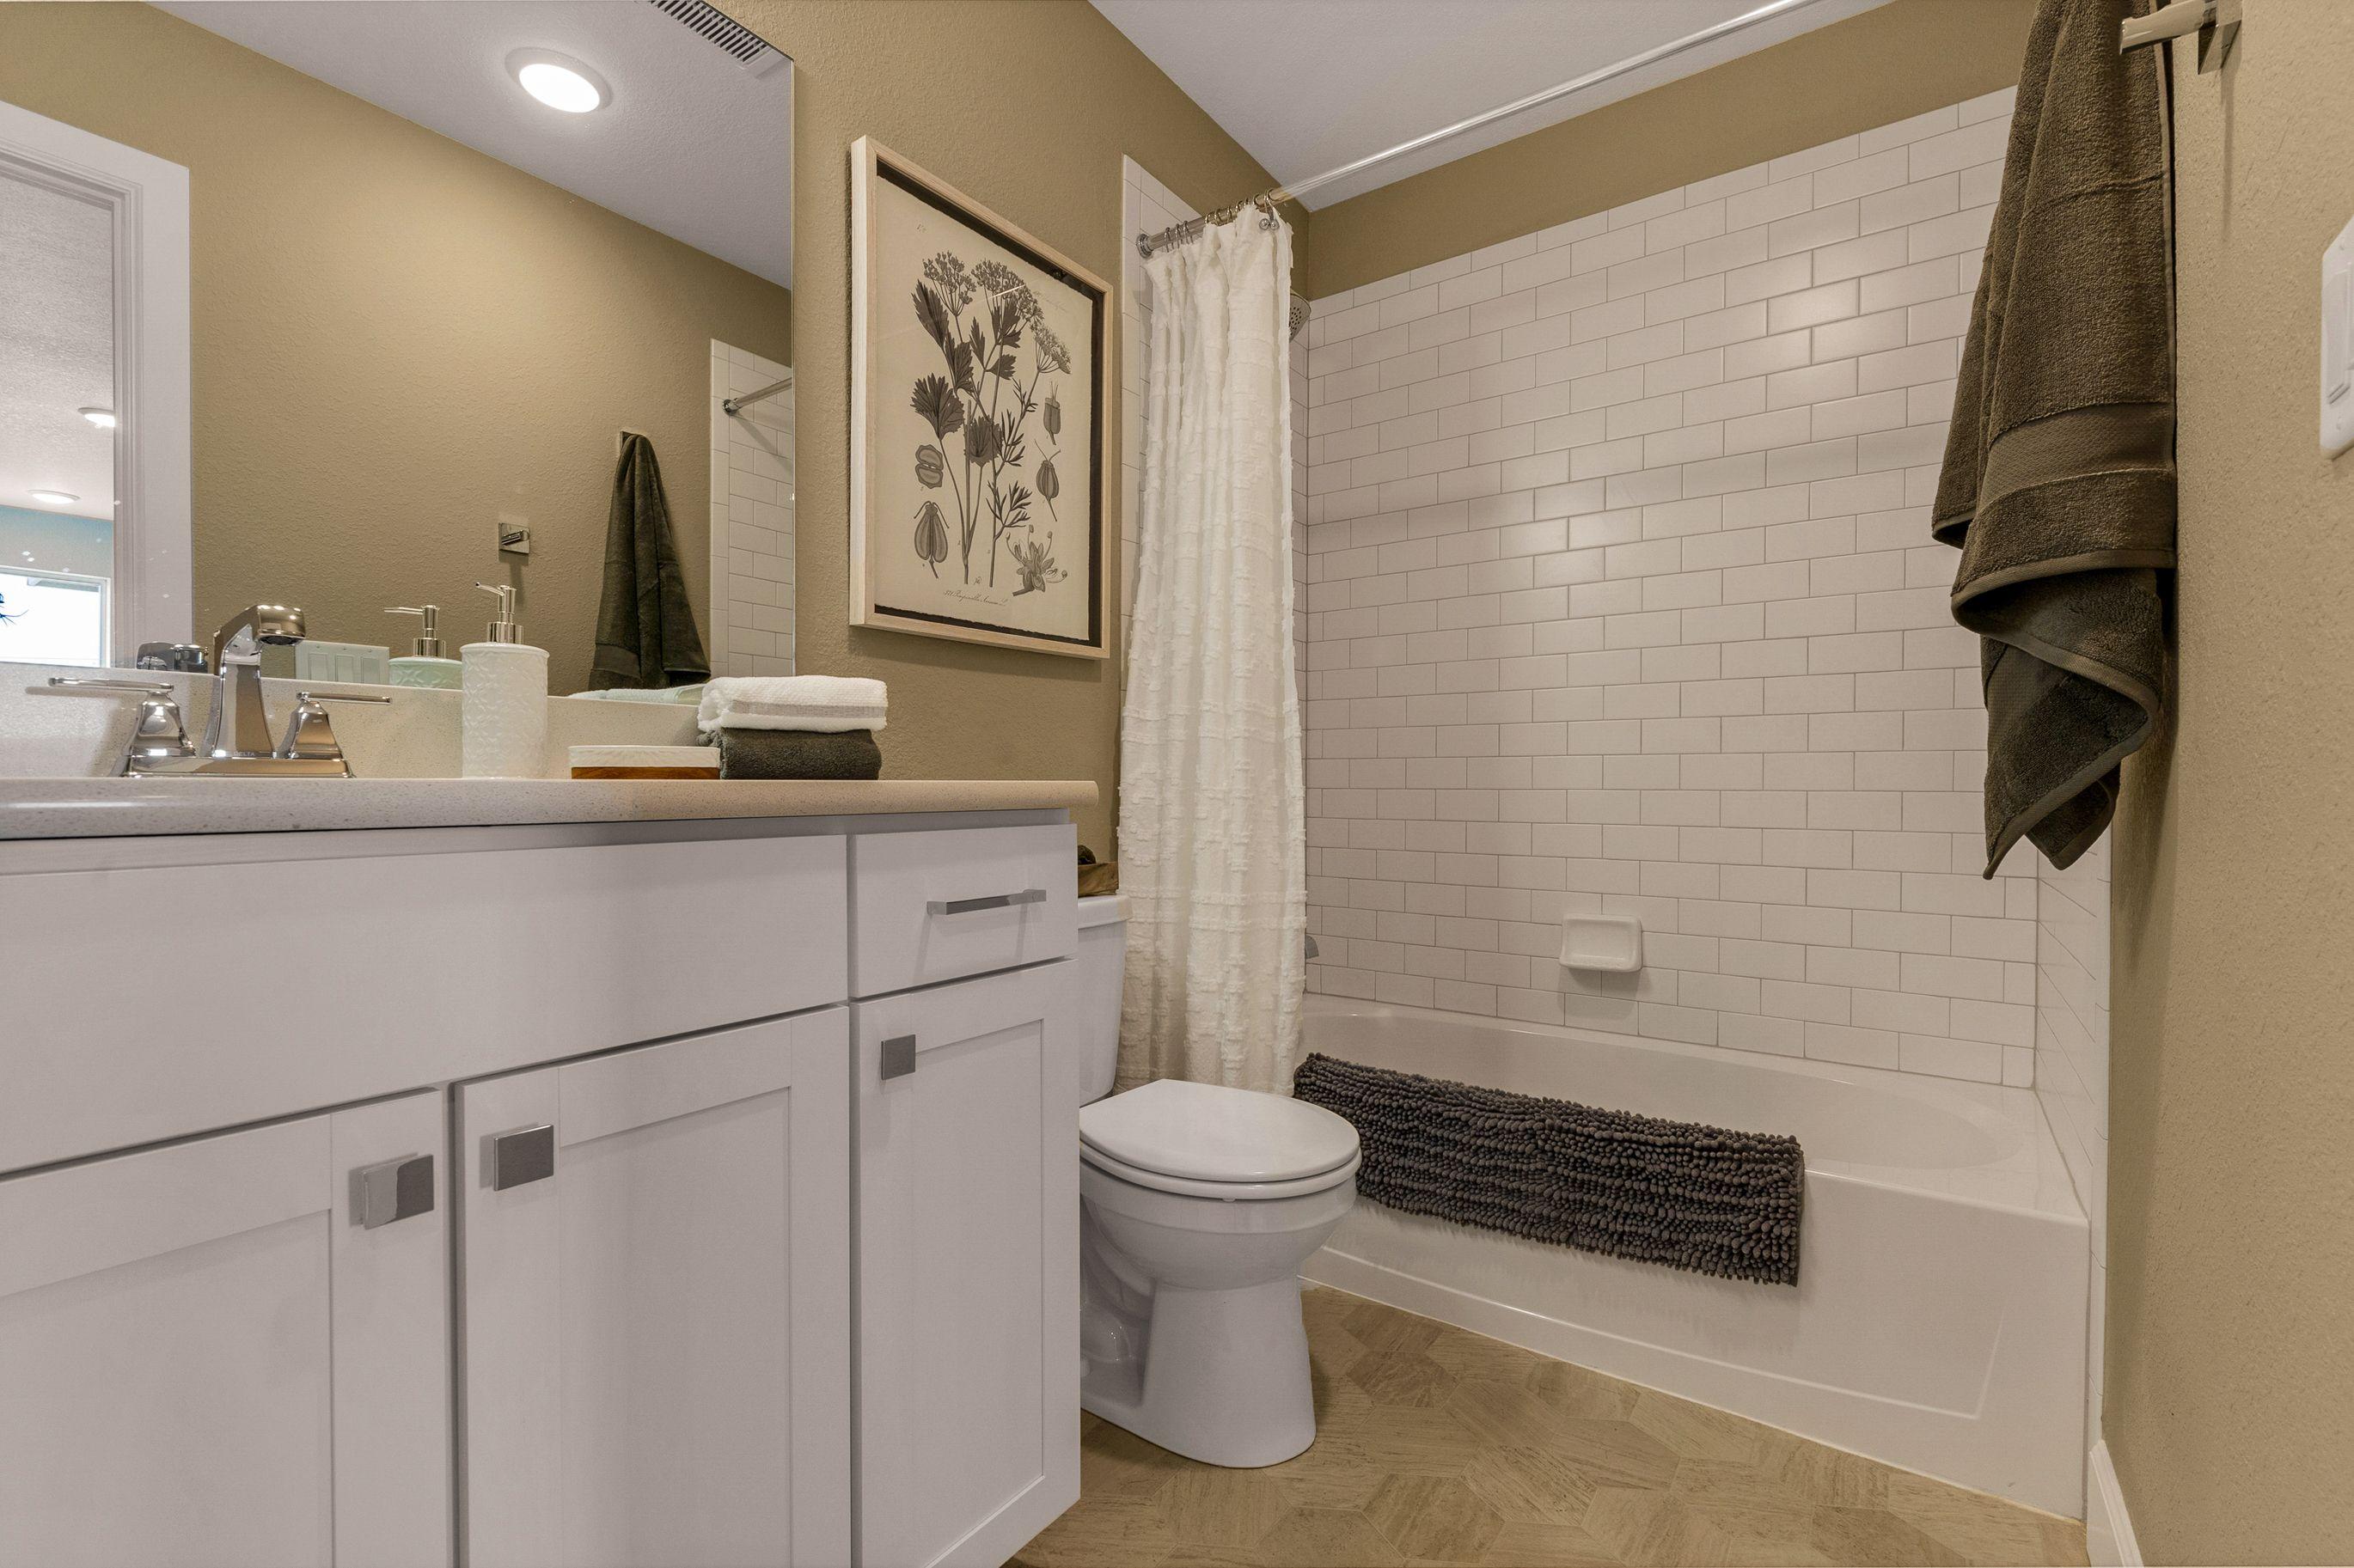 Bathroom featured in The Alpine By JM Weston Homes in Colorado Springs, CO